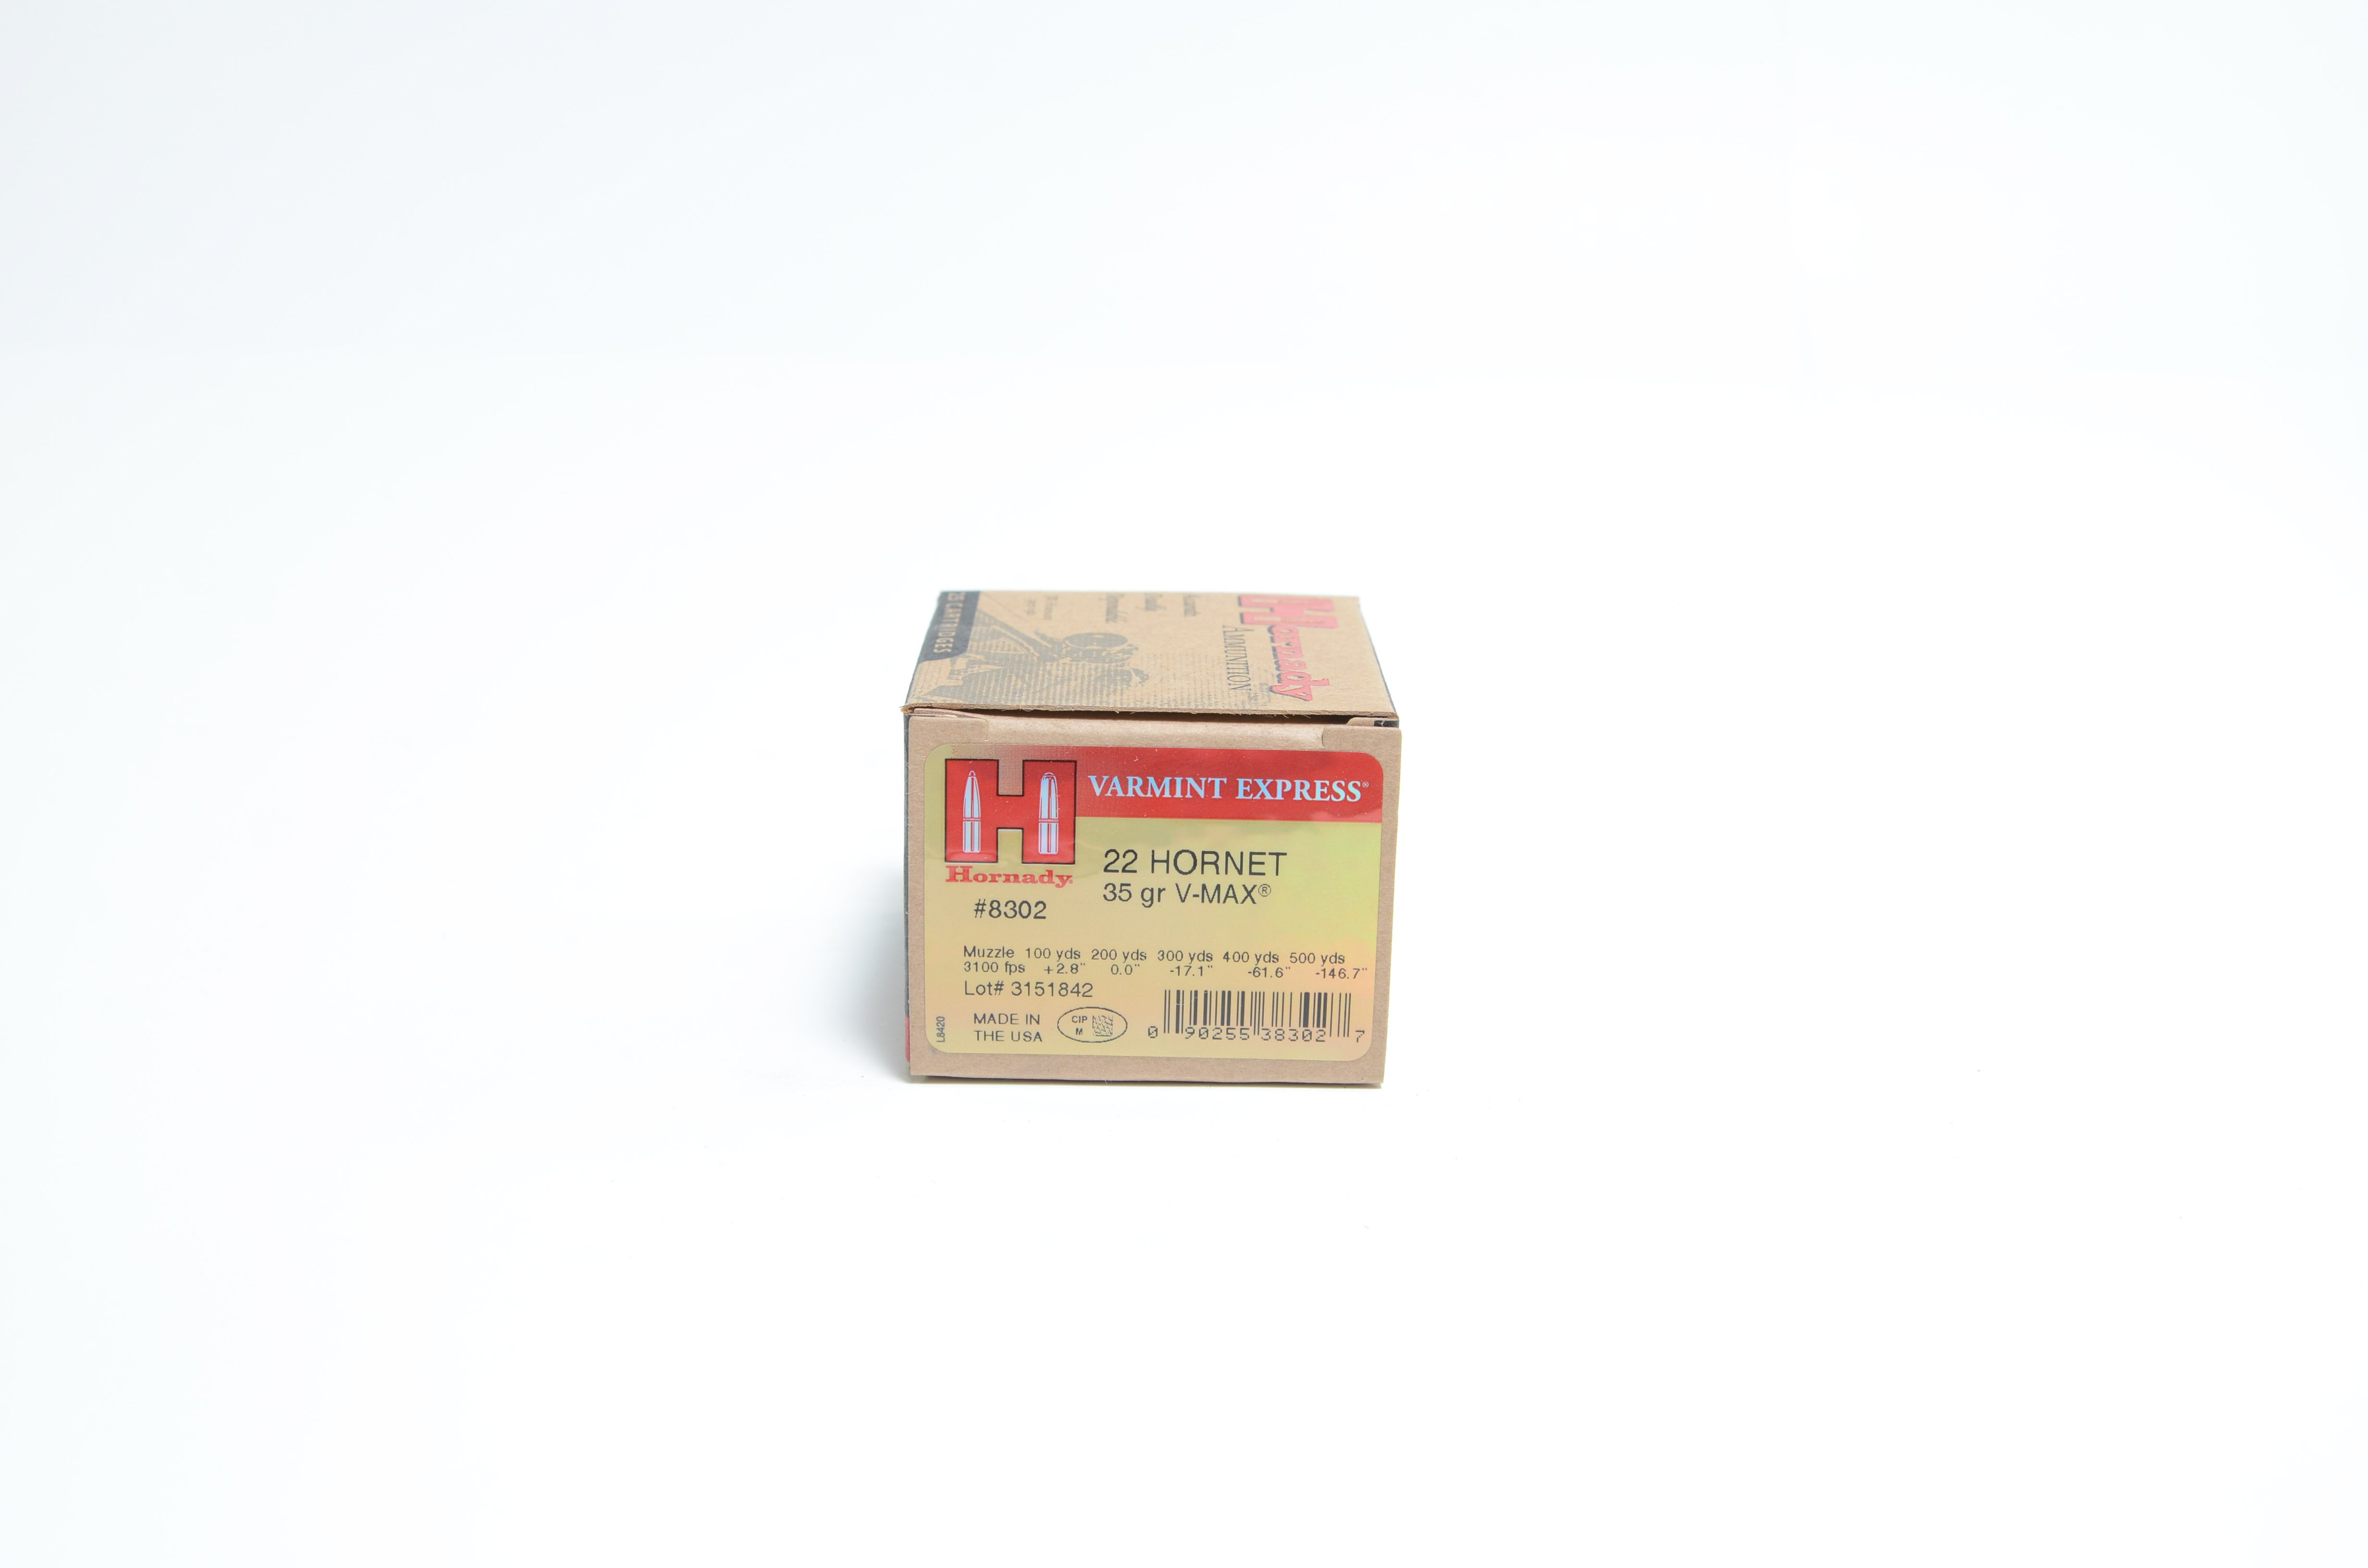 22 Hornet Ammo For Sale |  22 Hornet Ammo |  22 Hornet Ammo